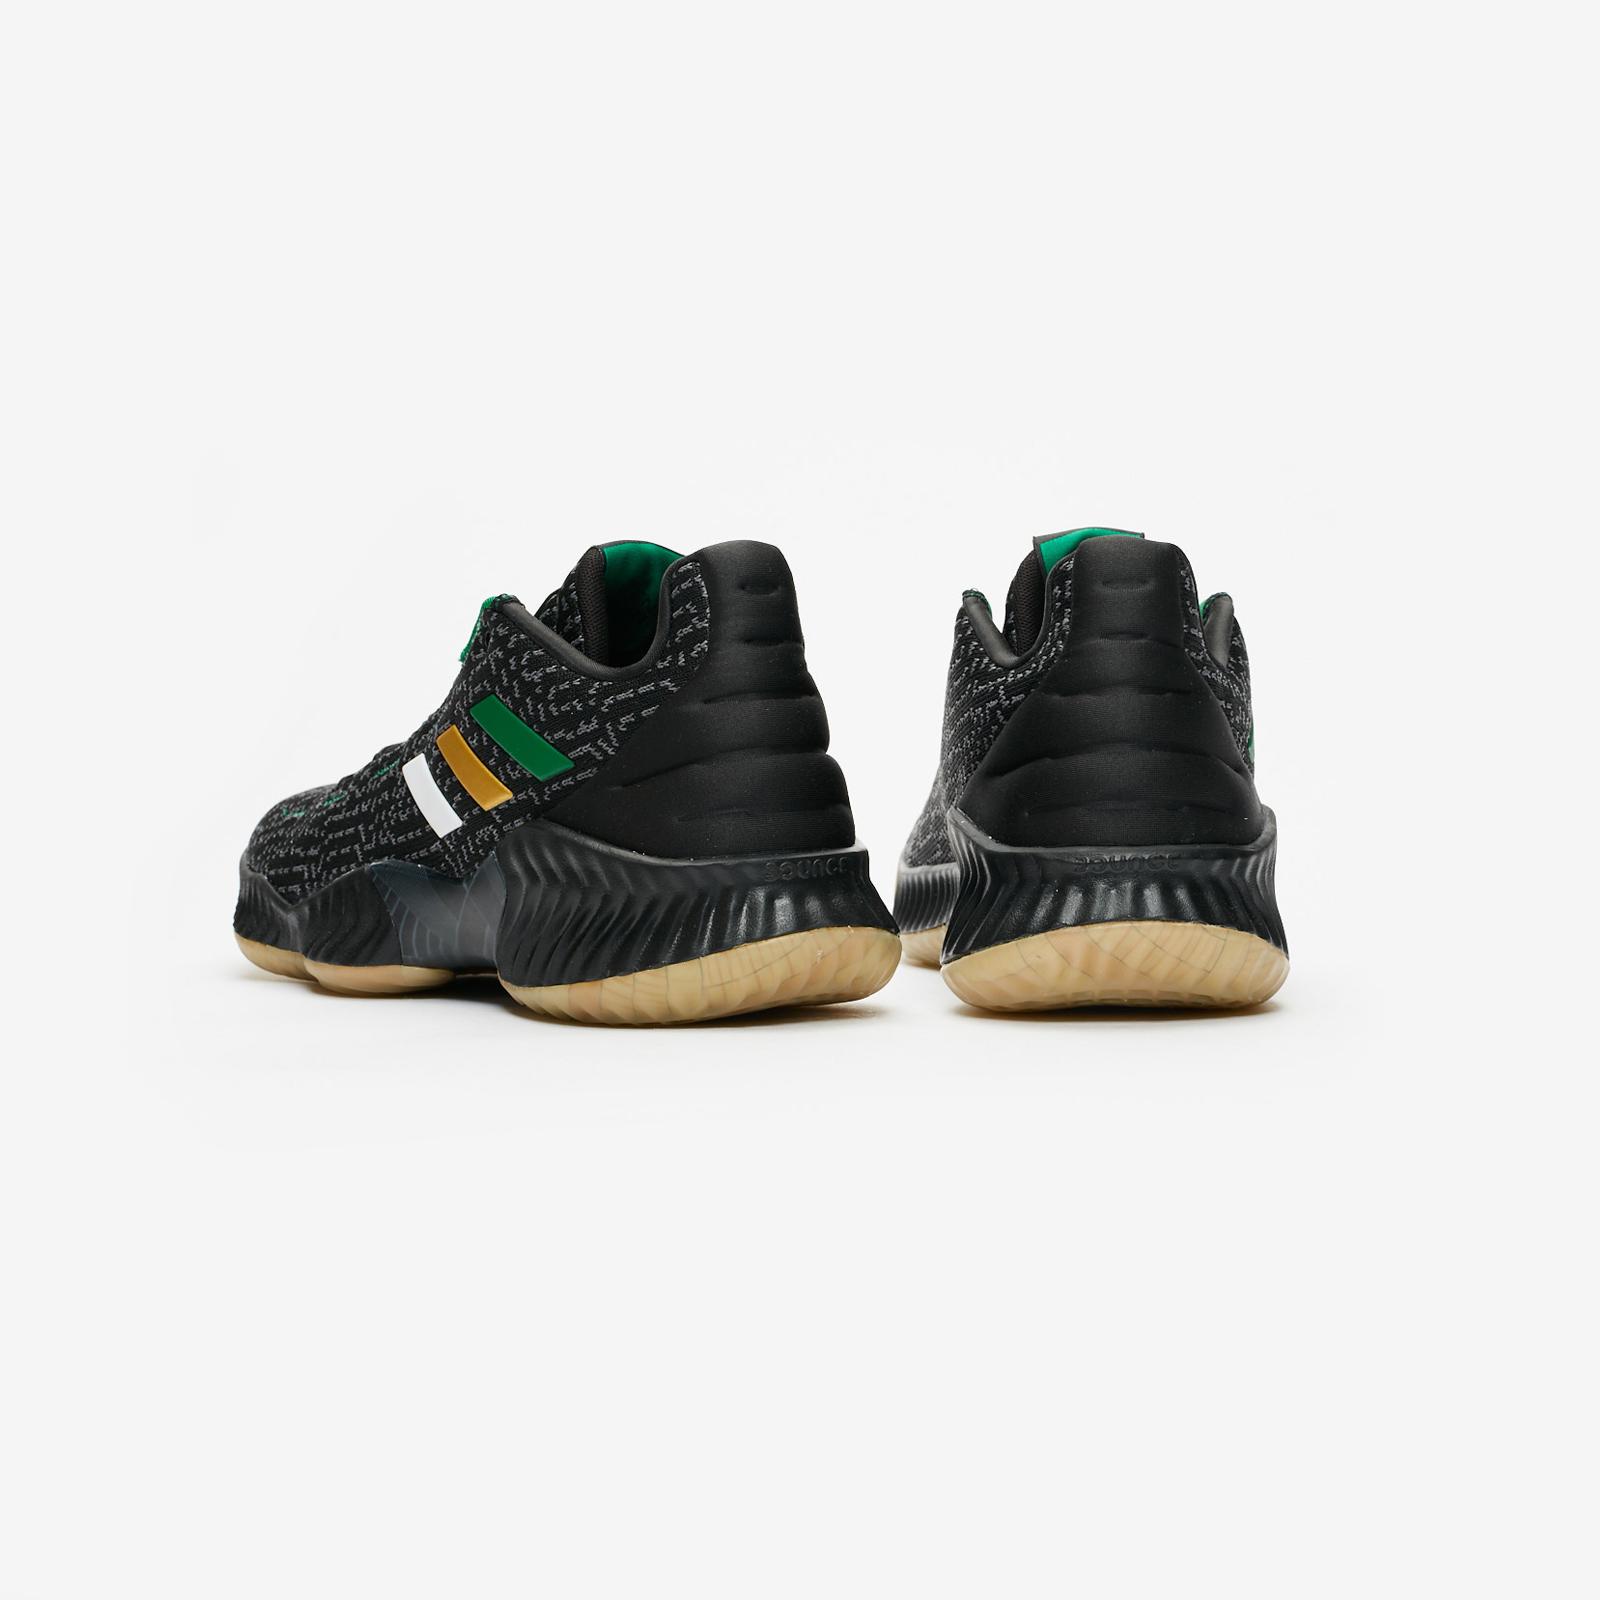 1ace766493c7 adidas PB Low 18 - F36940 - Sneakersnstuff